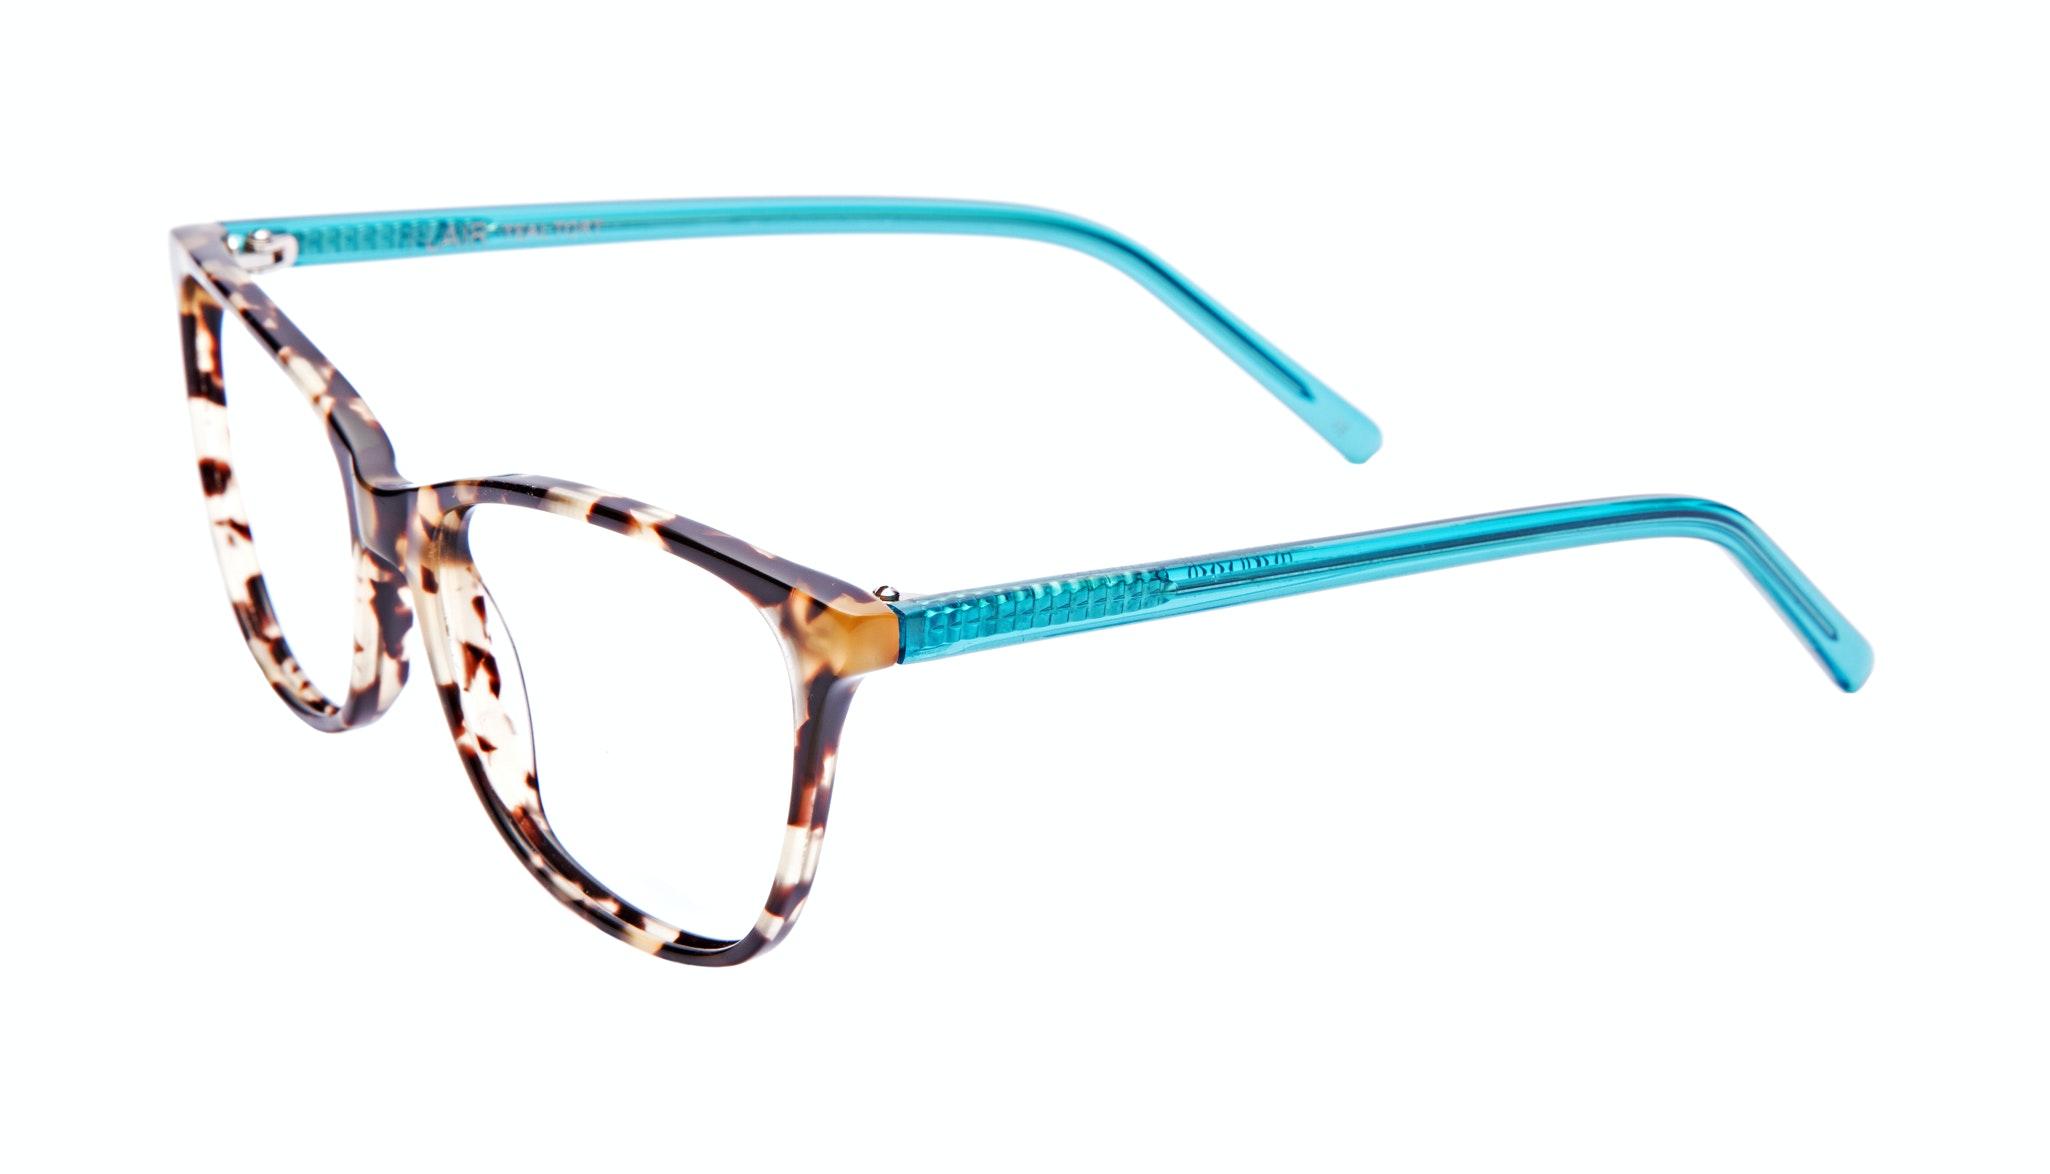 Affordable Fashion Glasses Cat Eye Eyeglasses Women Flair Teal Tort Tilt